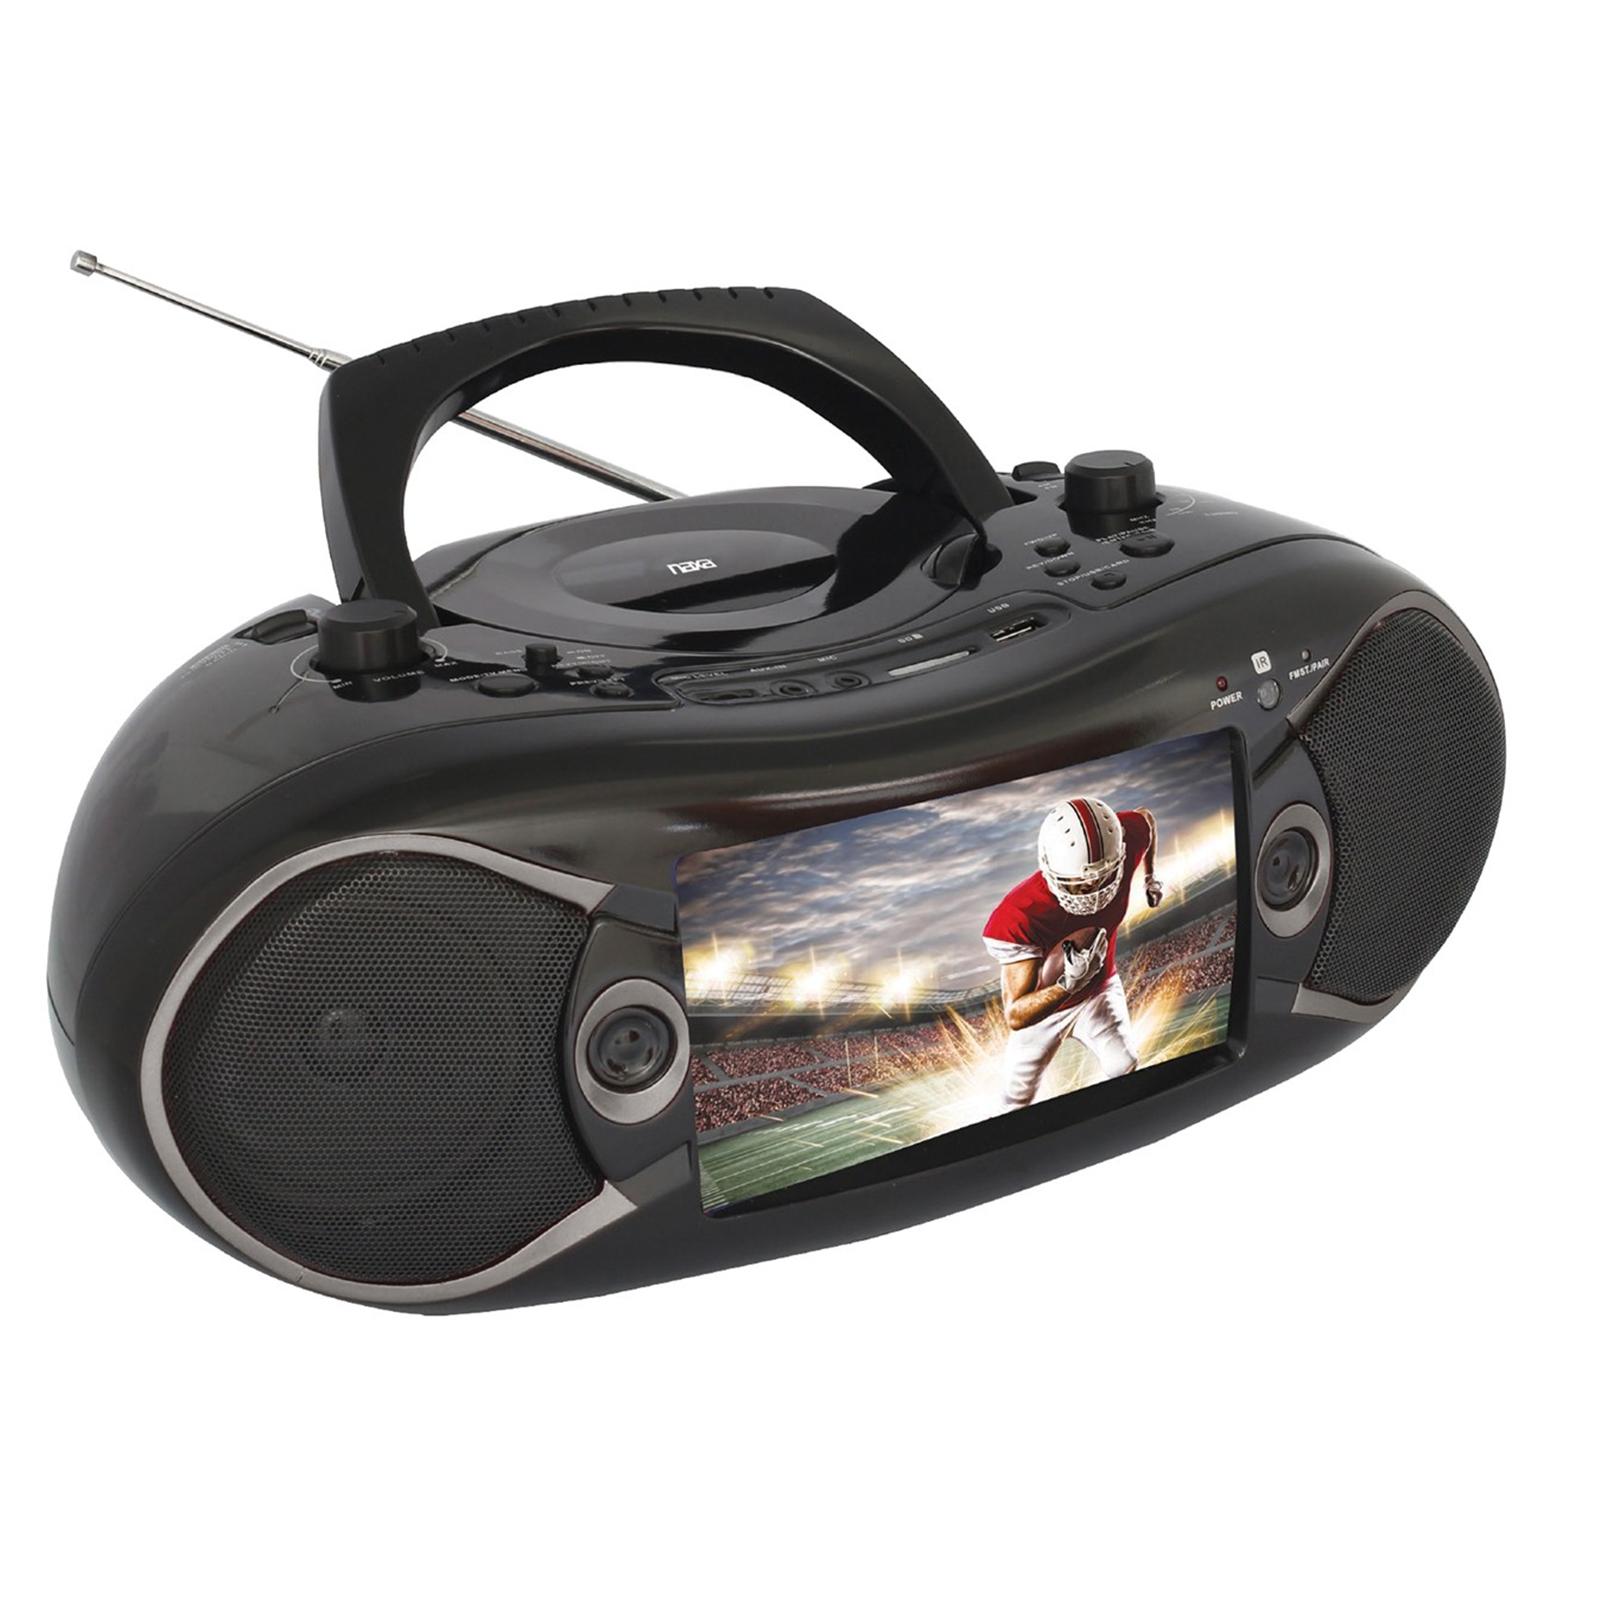 Naxa Boombox with TV/DVD/Bluetooth - $125.99 at Walmart